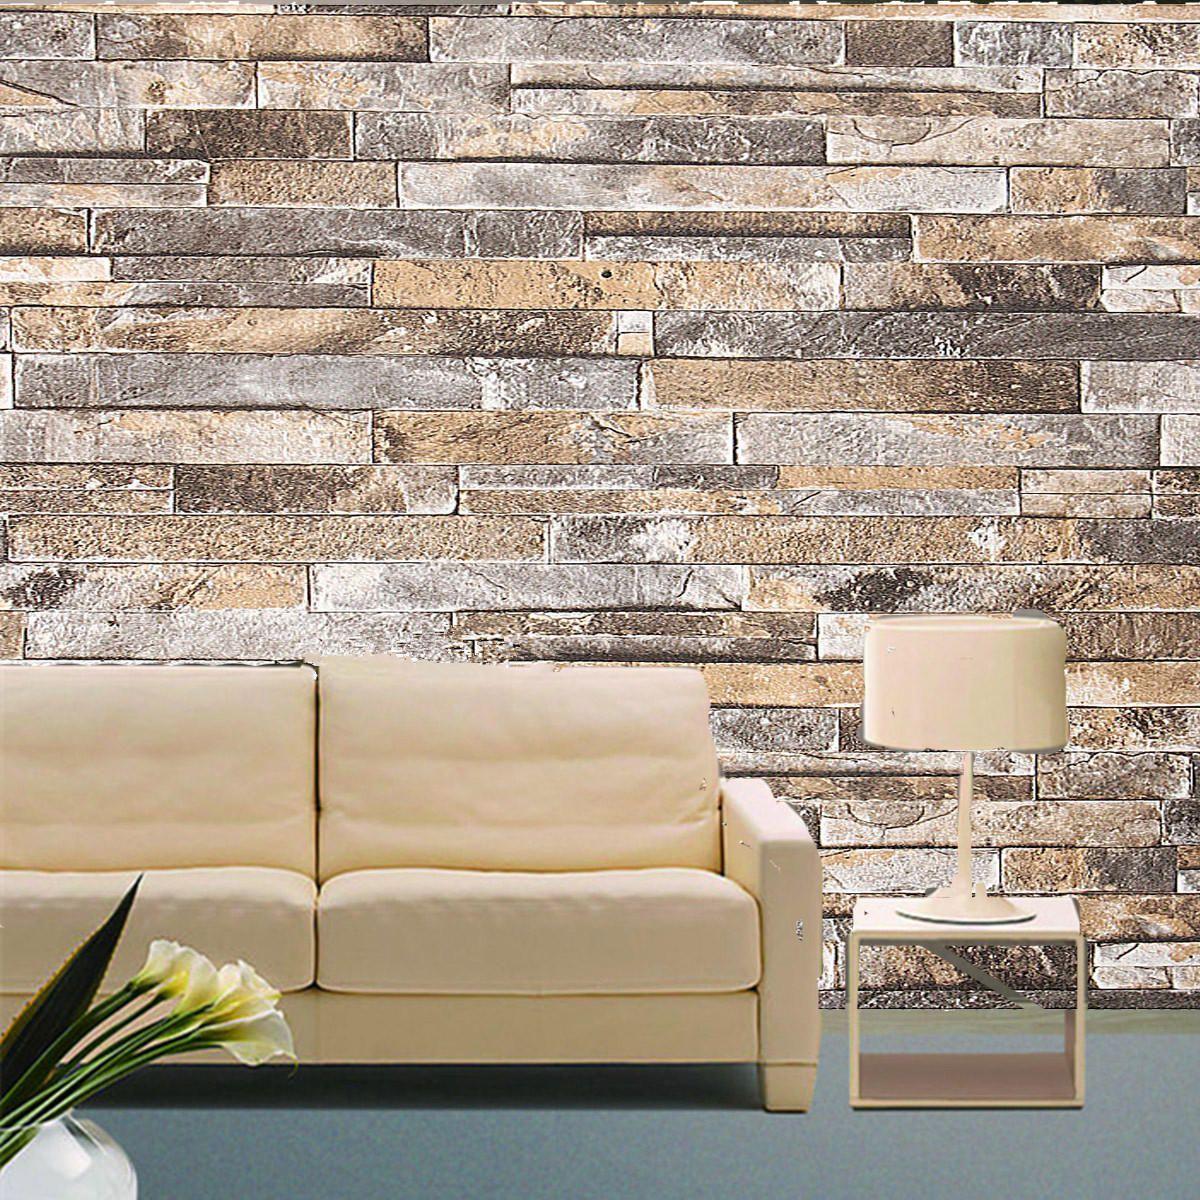 3d Wall Paper Brick Stone Pattern Vinyl Wallpaper Roll Living Room